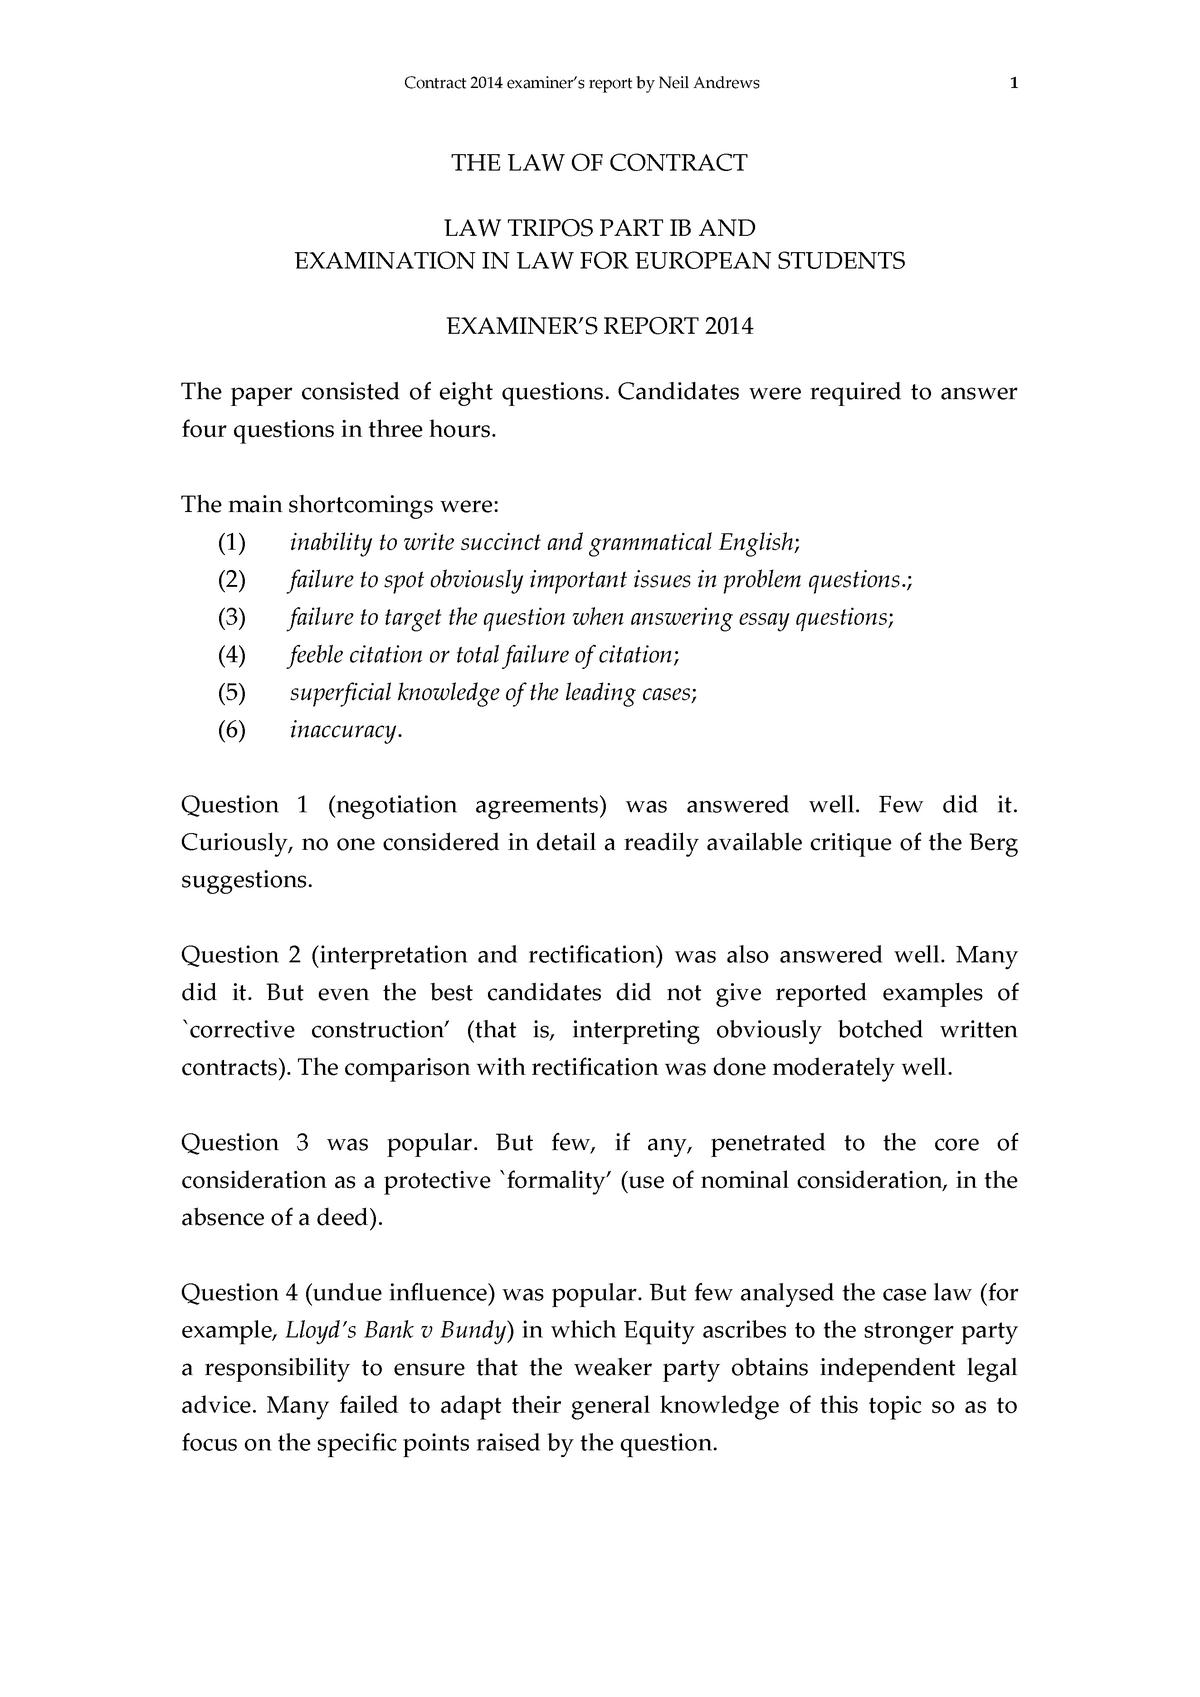 Exam 2014 - L100: Law - StuDocu